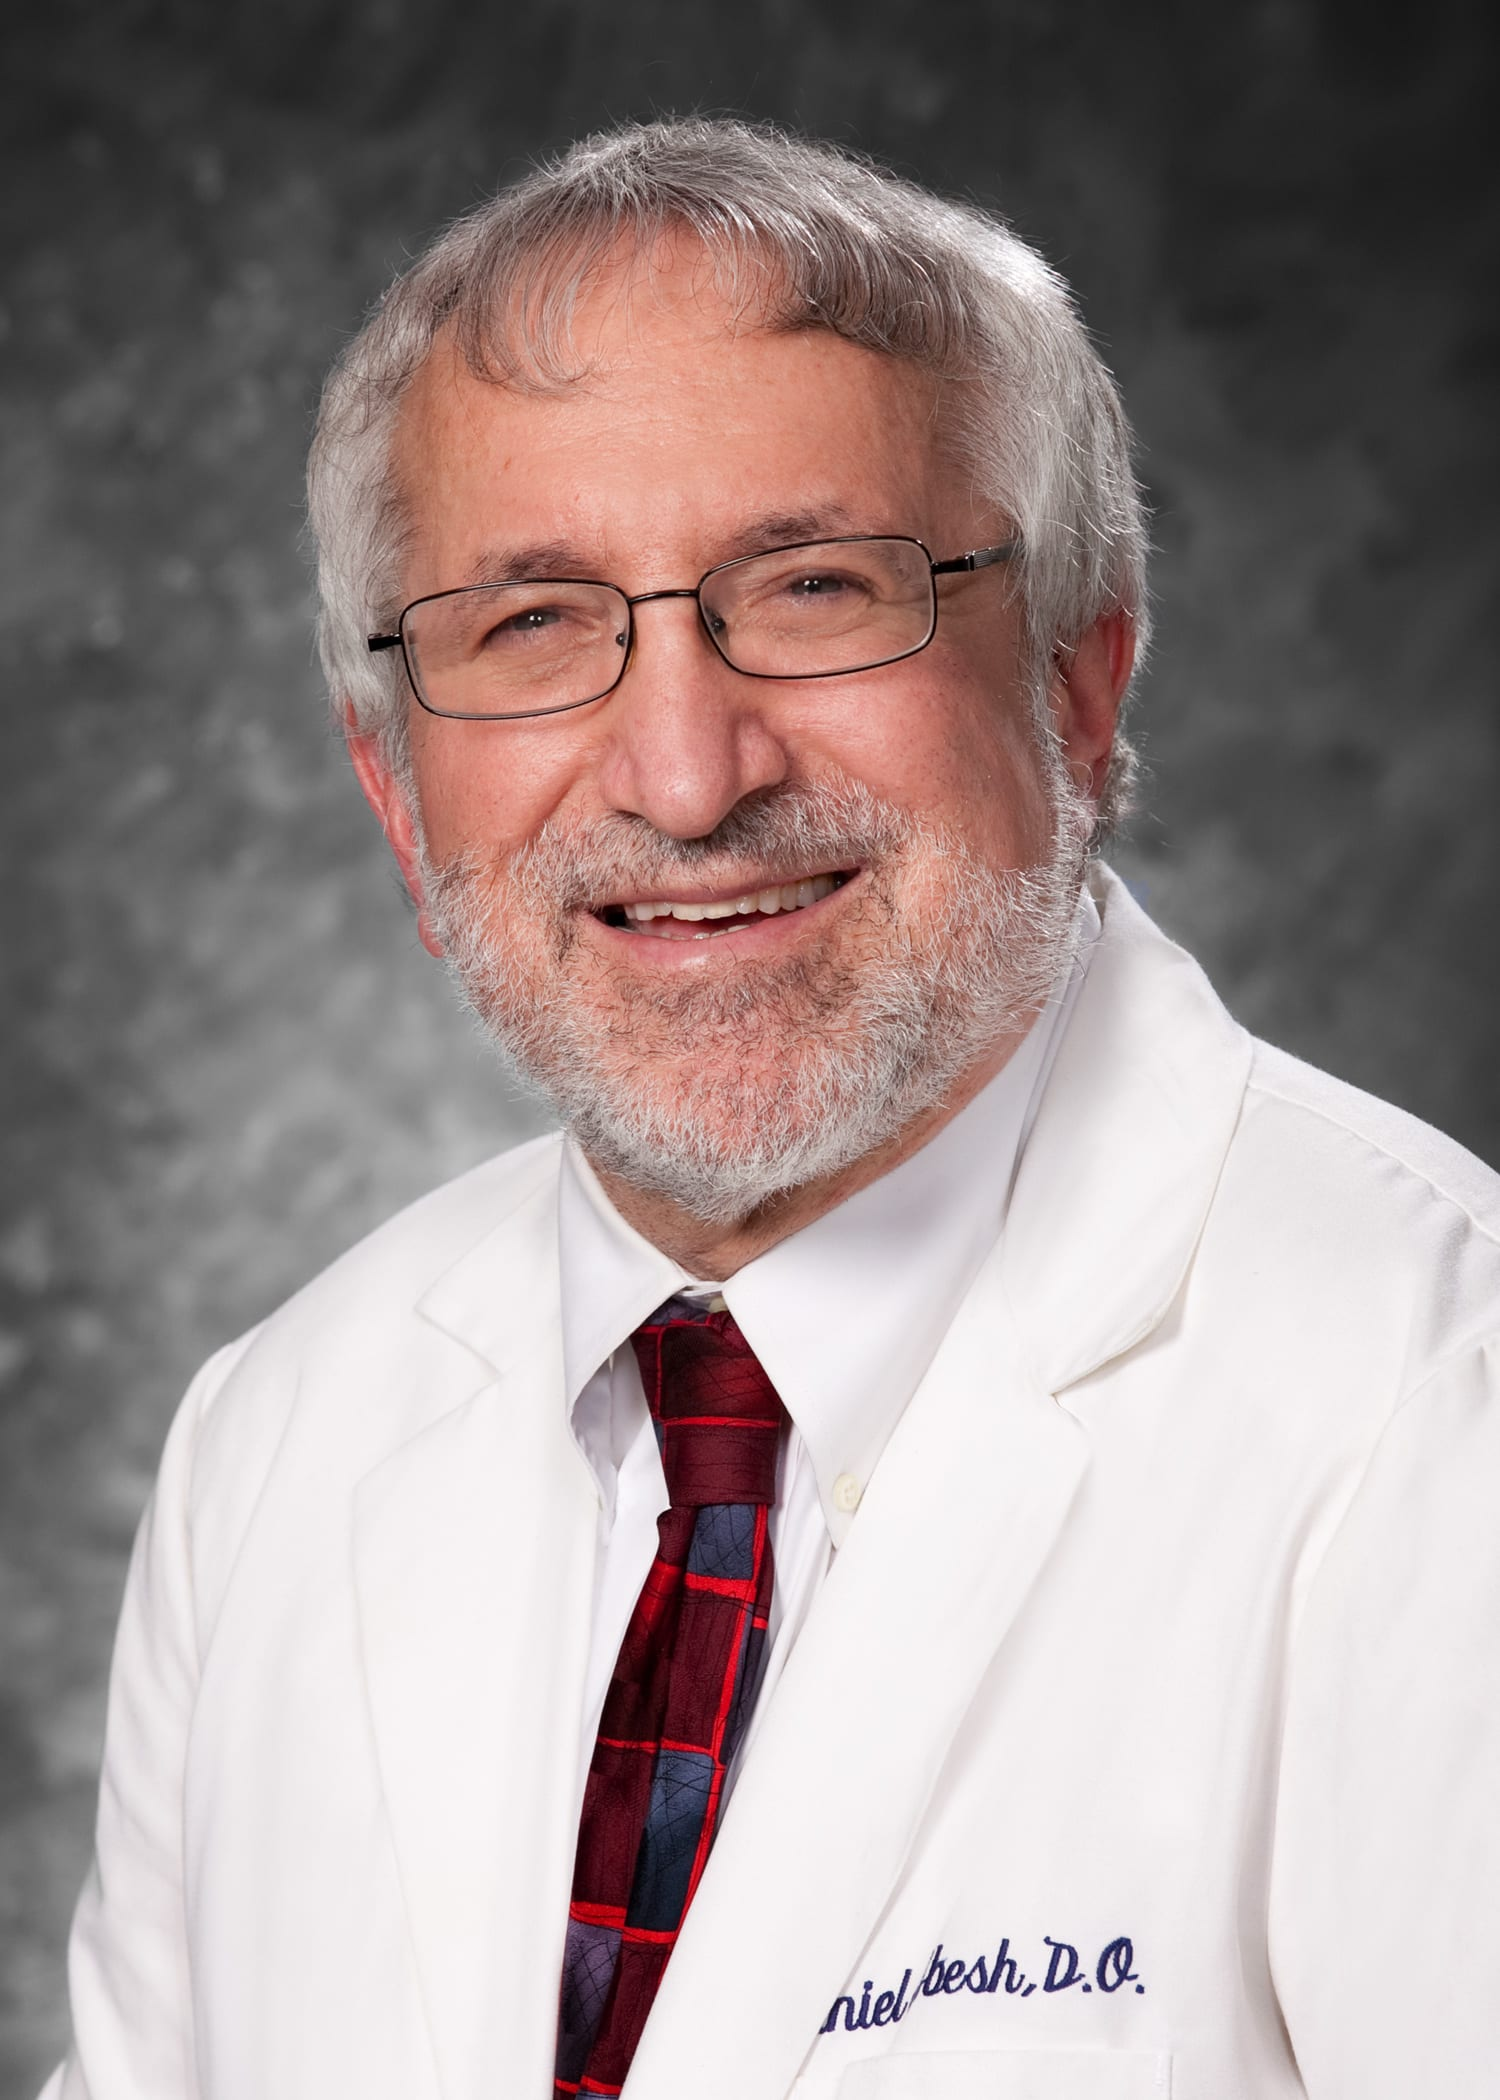 Daniel C Abesh, DO Family Medicine